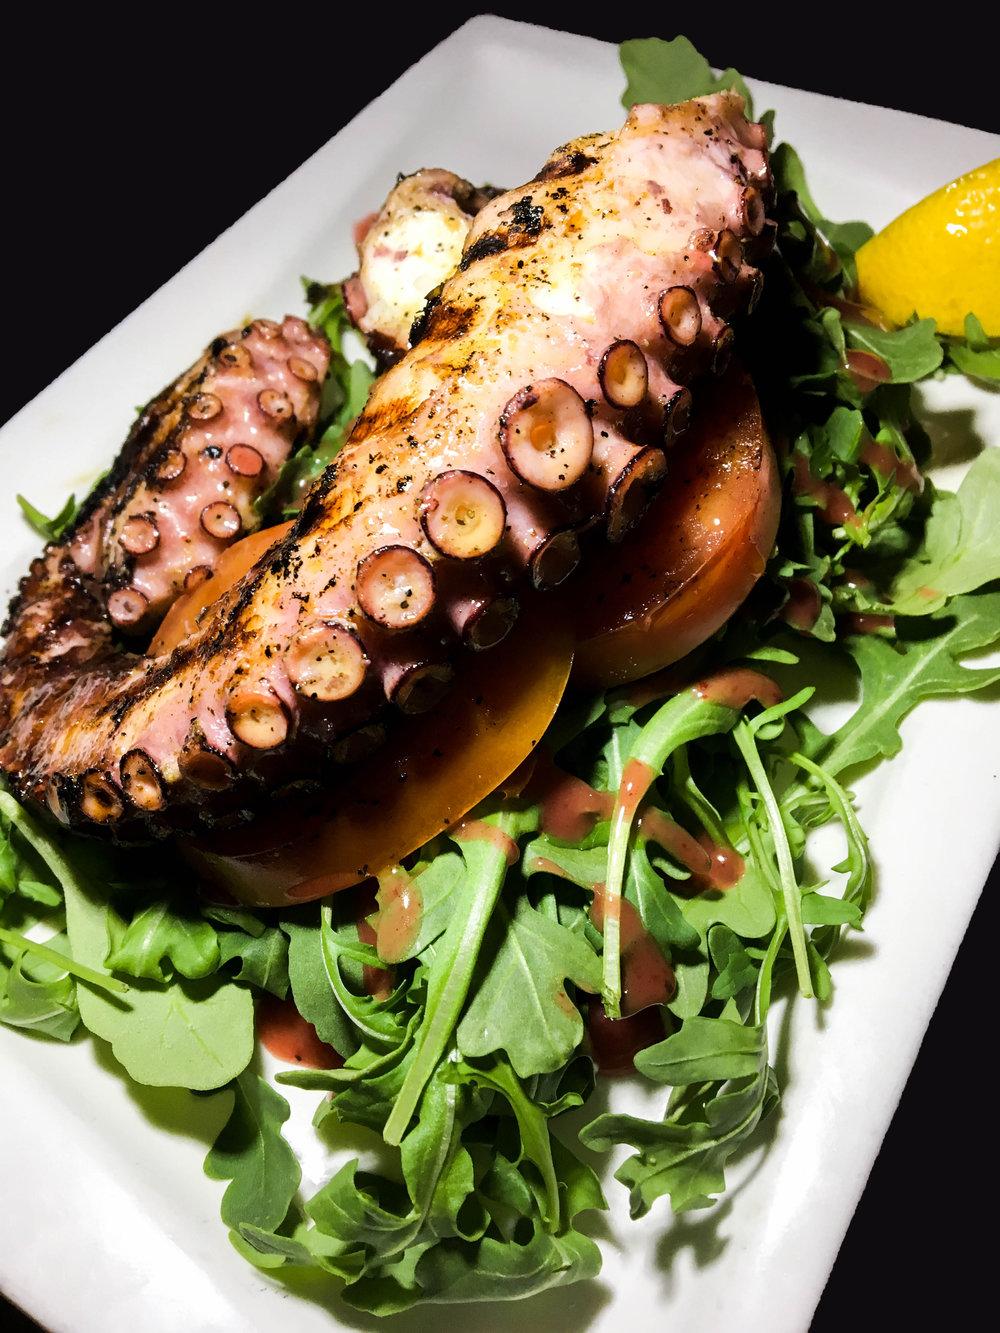 Grilled Mediterranean Octopus - Beefsteak Tomato, Arugula, Spanish EV Olive Oil